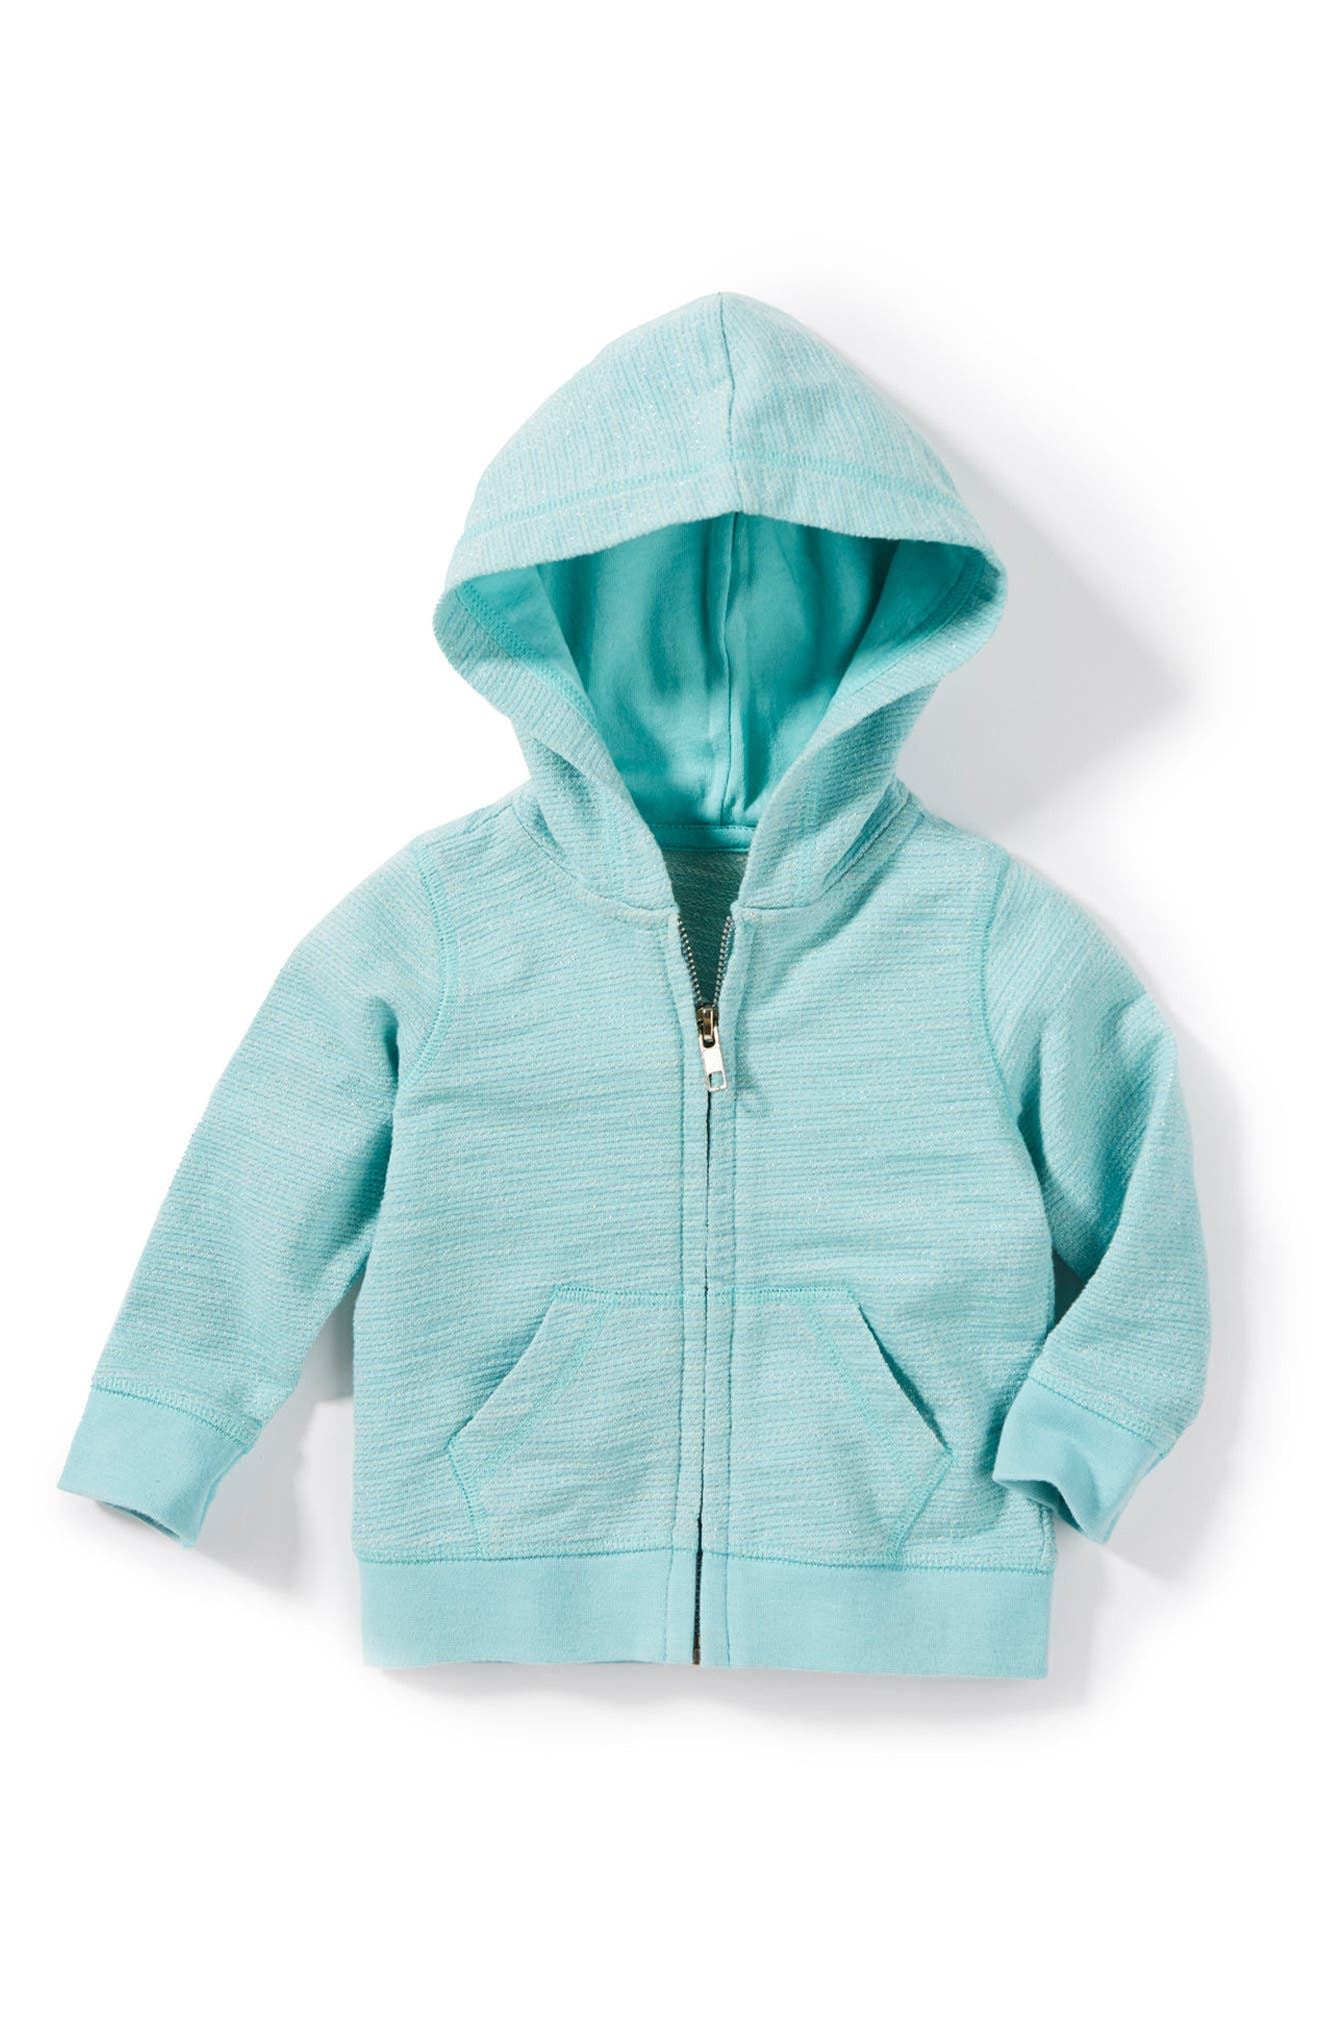 Peek Juniper Zip Up Hoodie,                         Main,                         color, Aqua